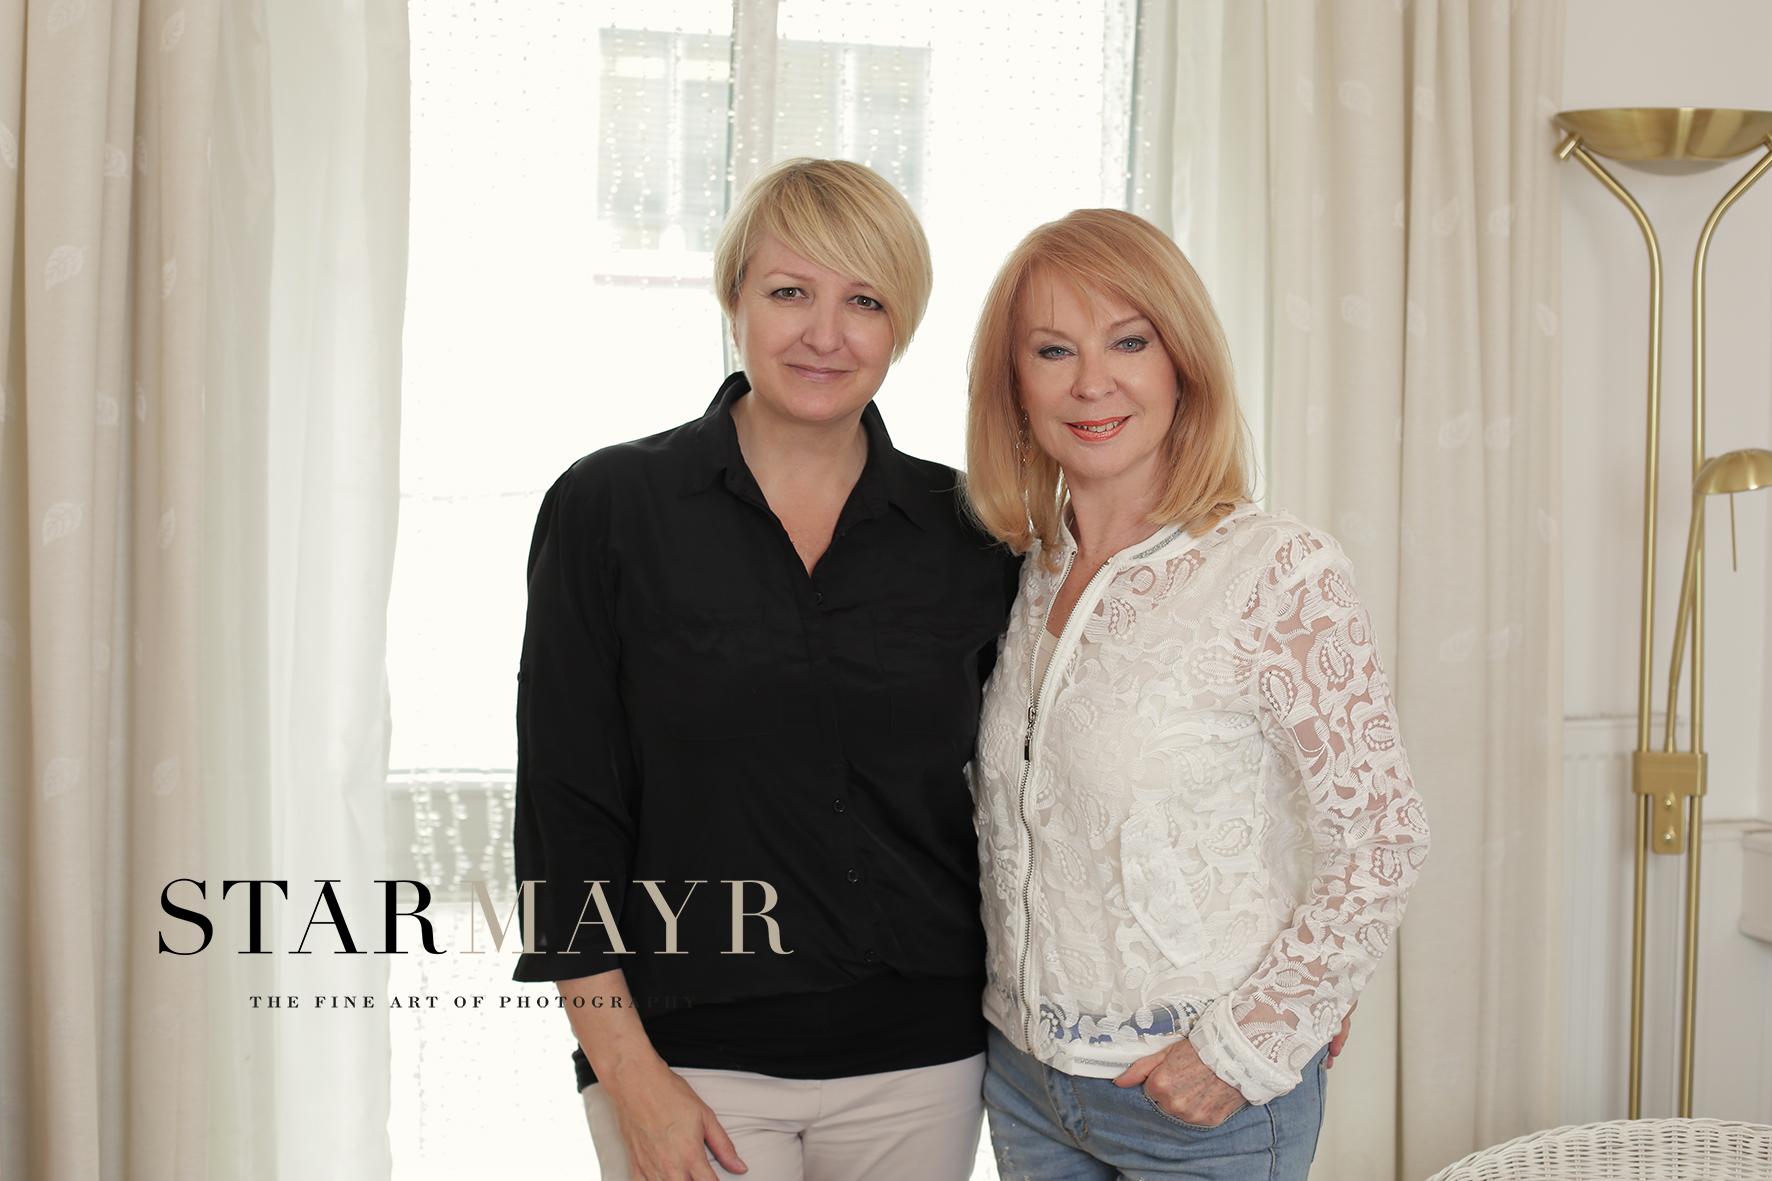 Fotgrafin Sabine Starmayr mit Astrologin Gerda Rogers